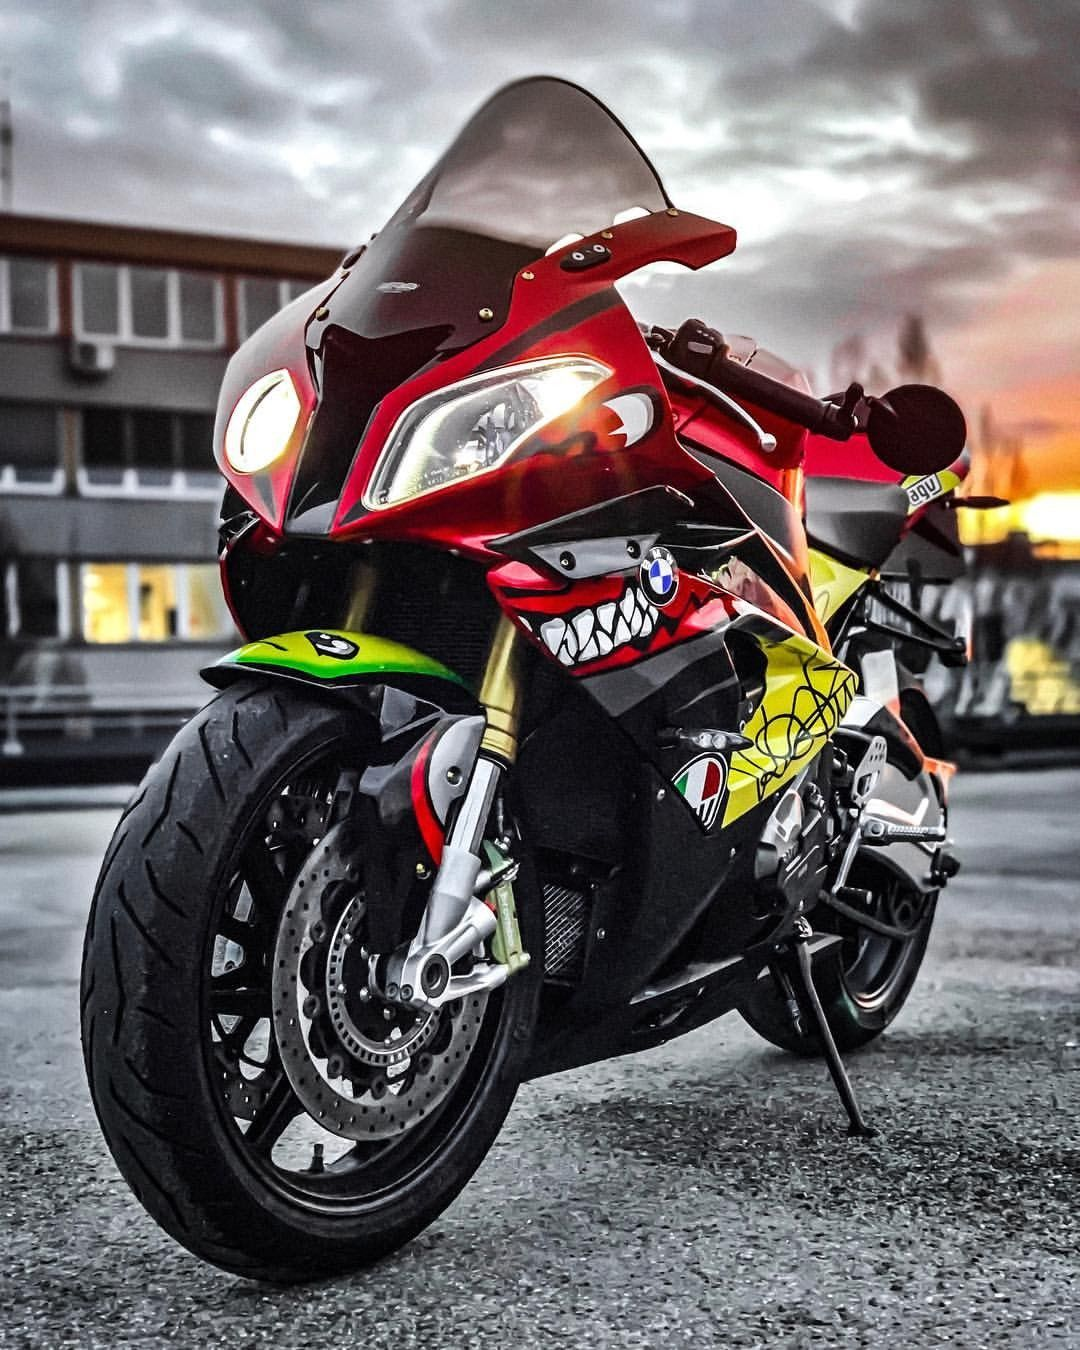 Ghim Của Tisan Tren 6 Bmw Sport Bike Bmw S1000rr Xe đẹp Xe Mo To